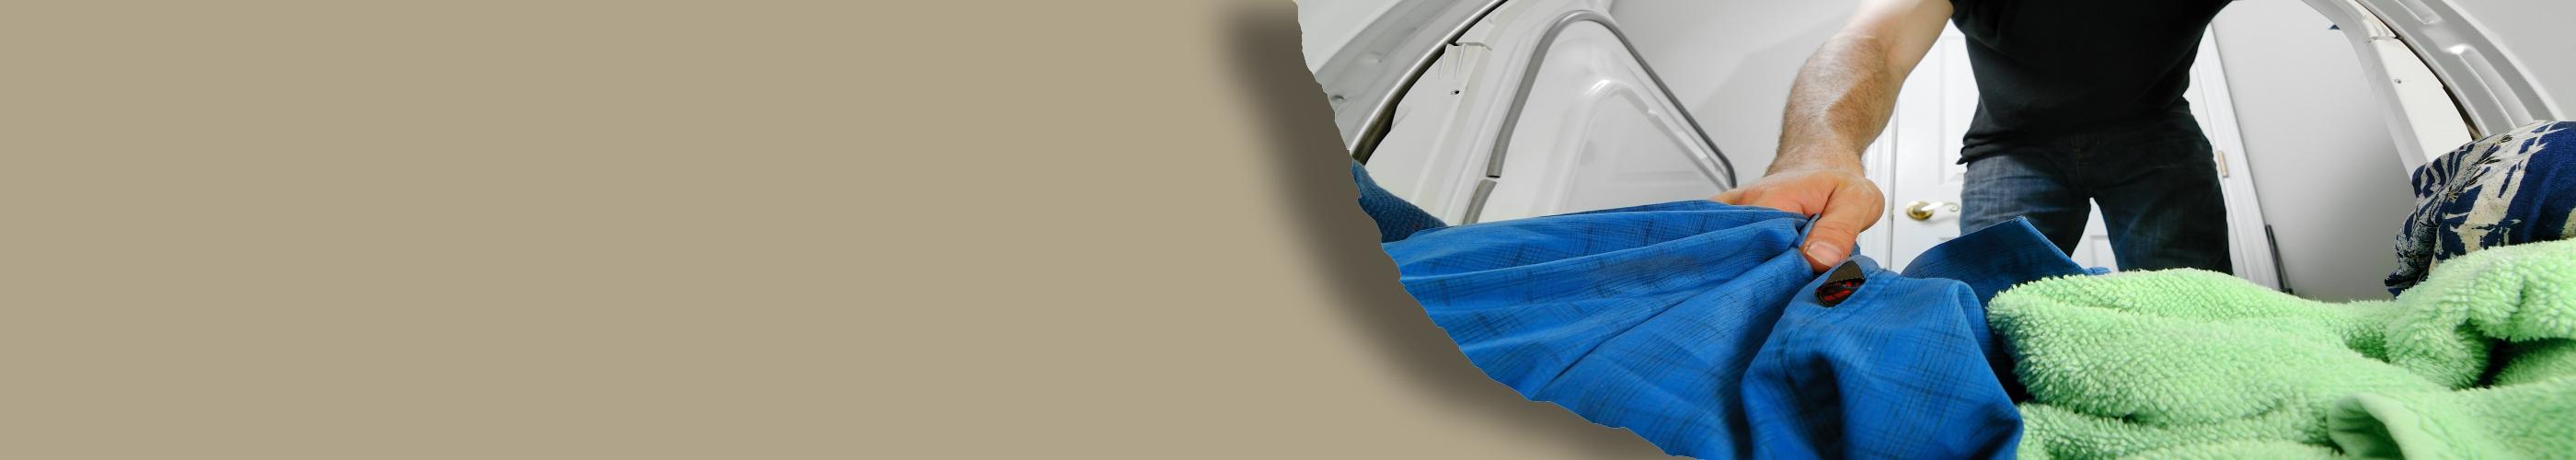 Laundrex-Banner-1400-w-x-250-4